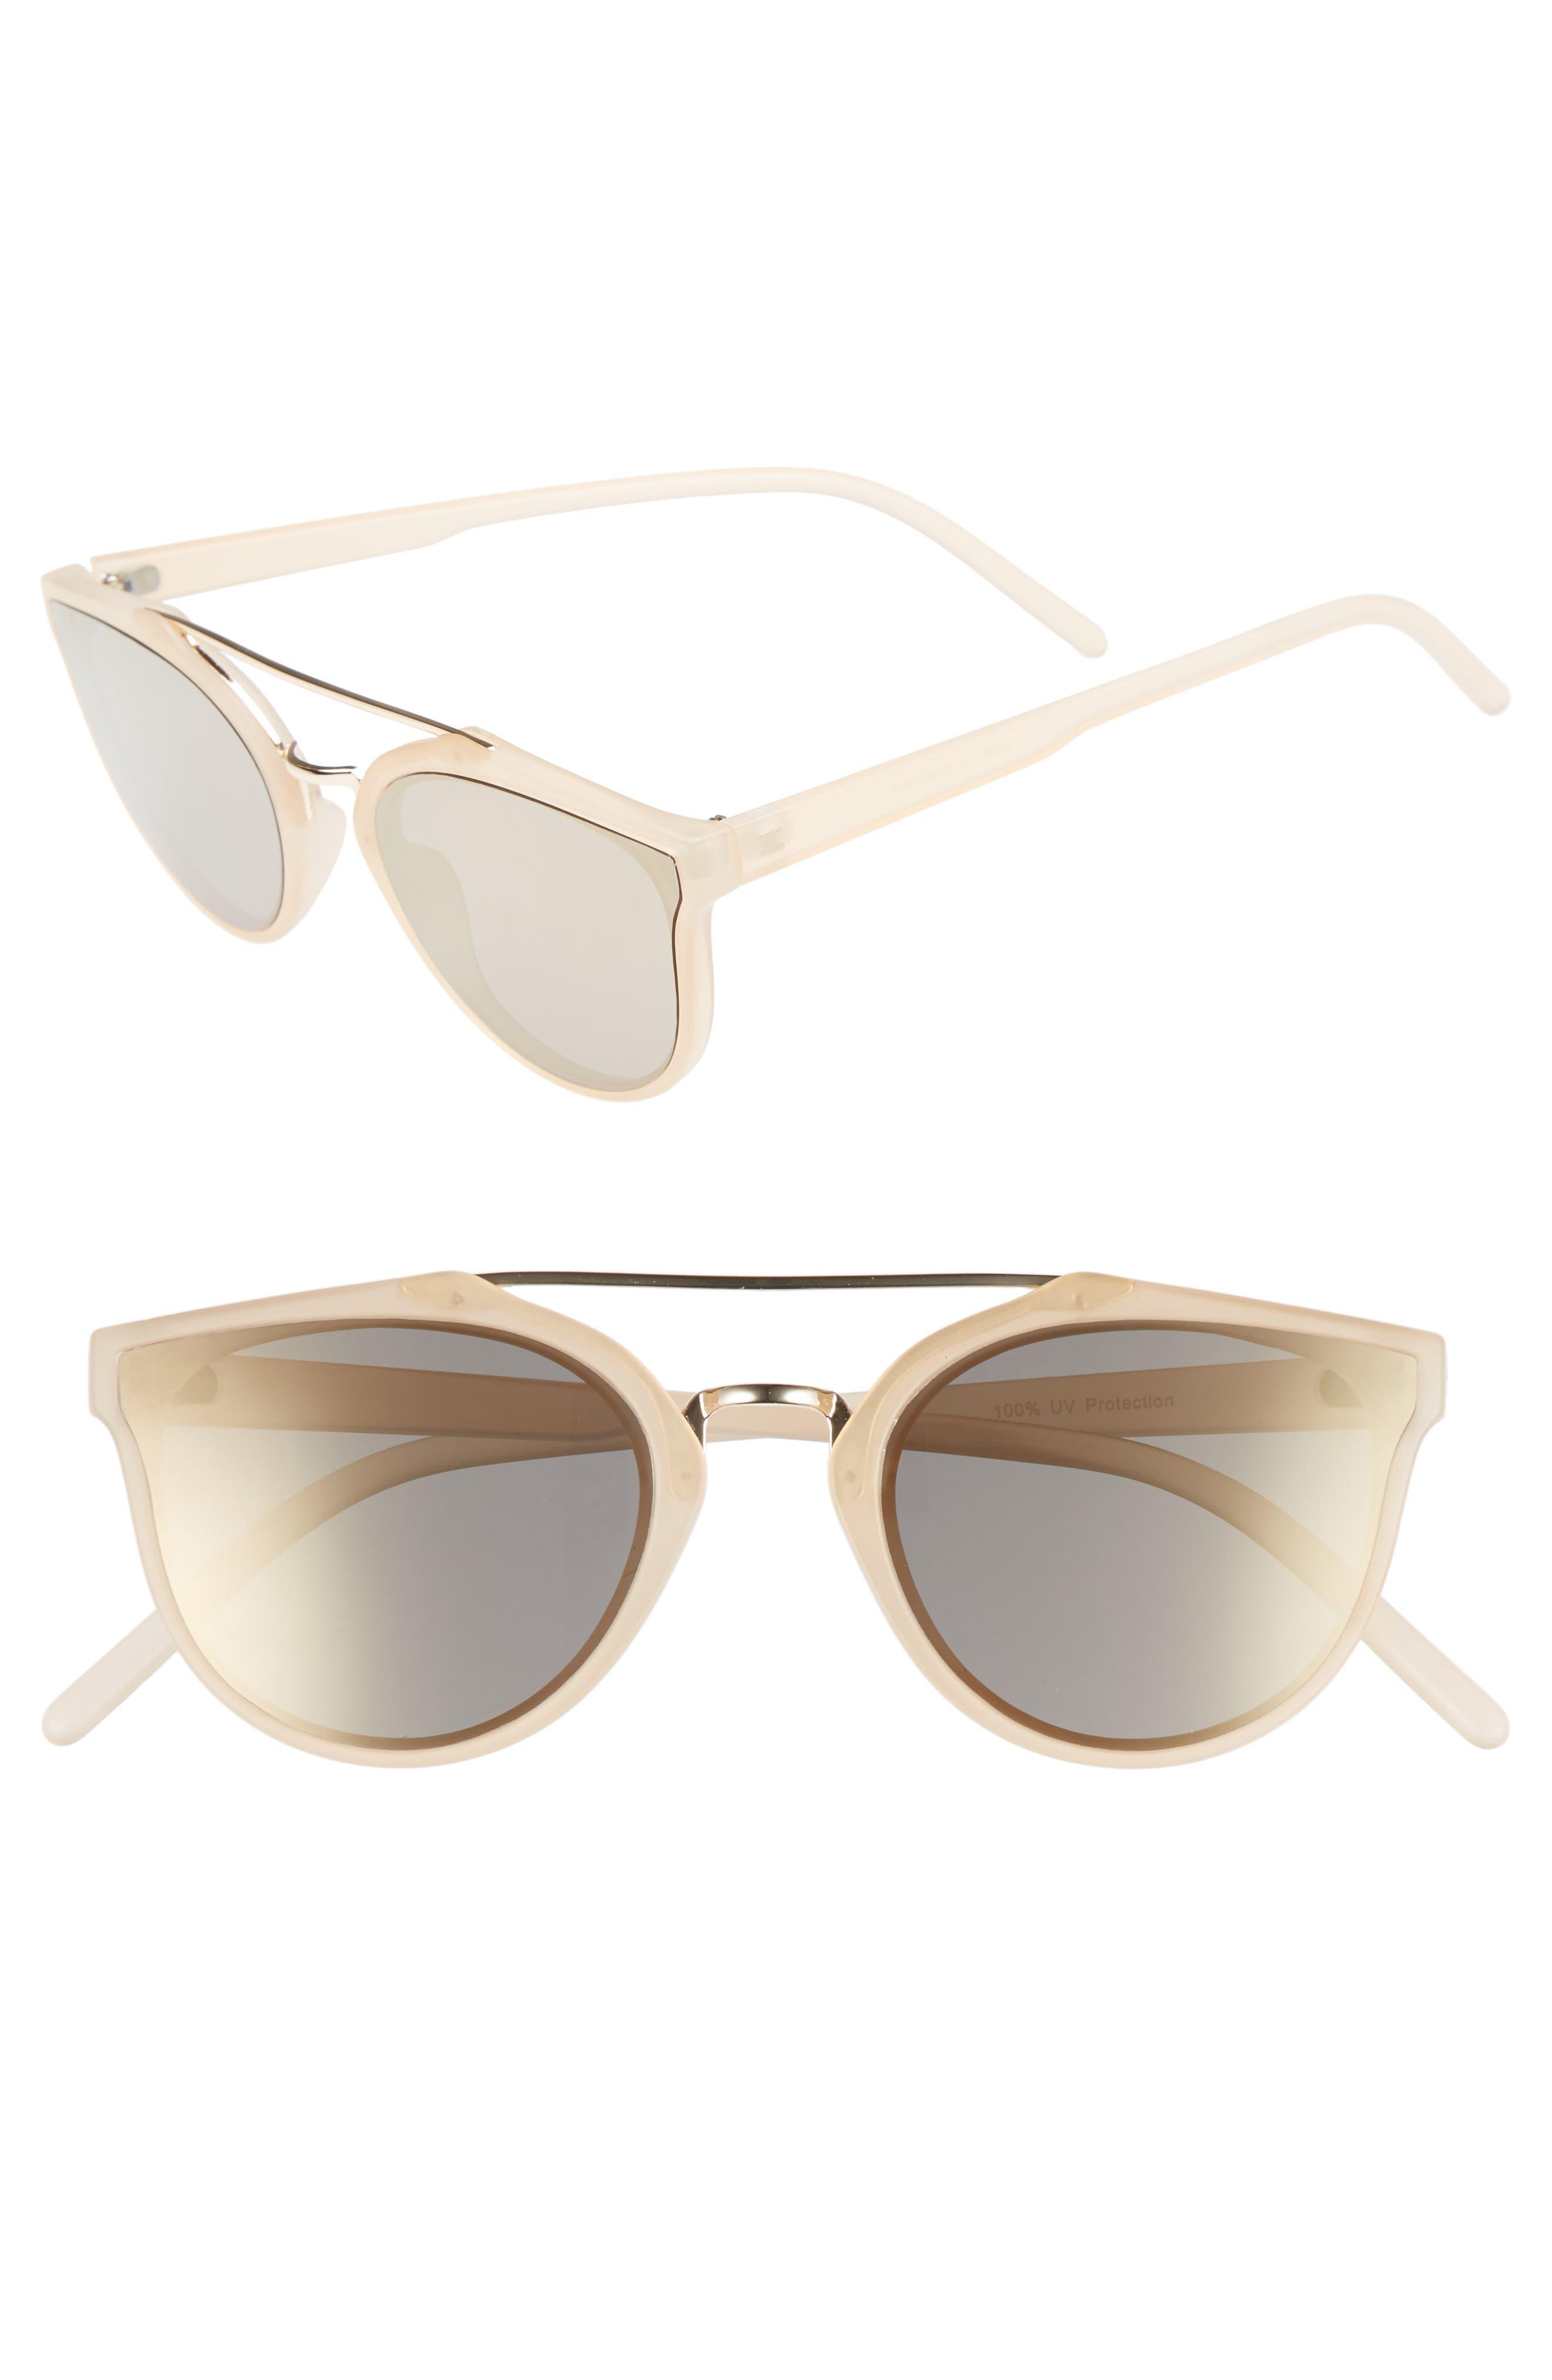 Aviator Sunglasses,                             Main thumbnail 1, color,                             950